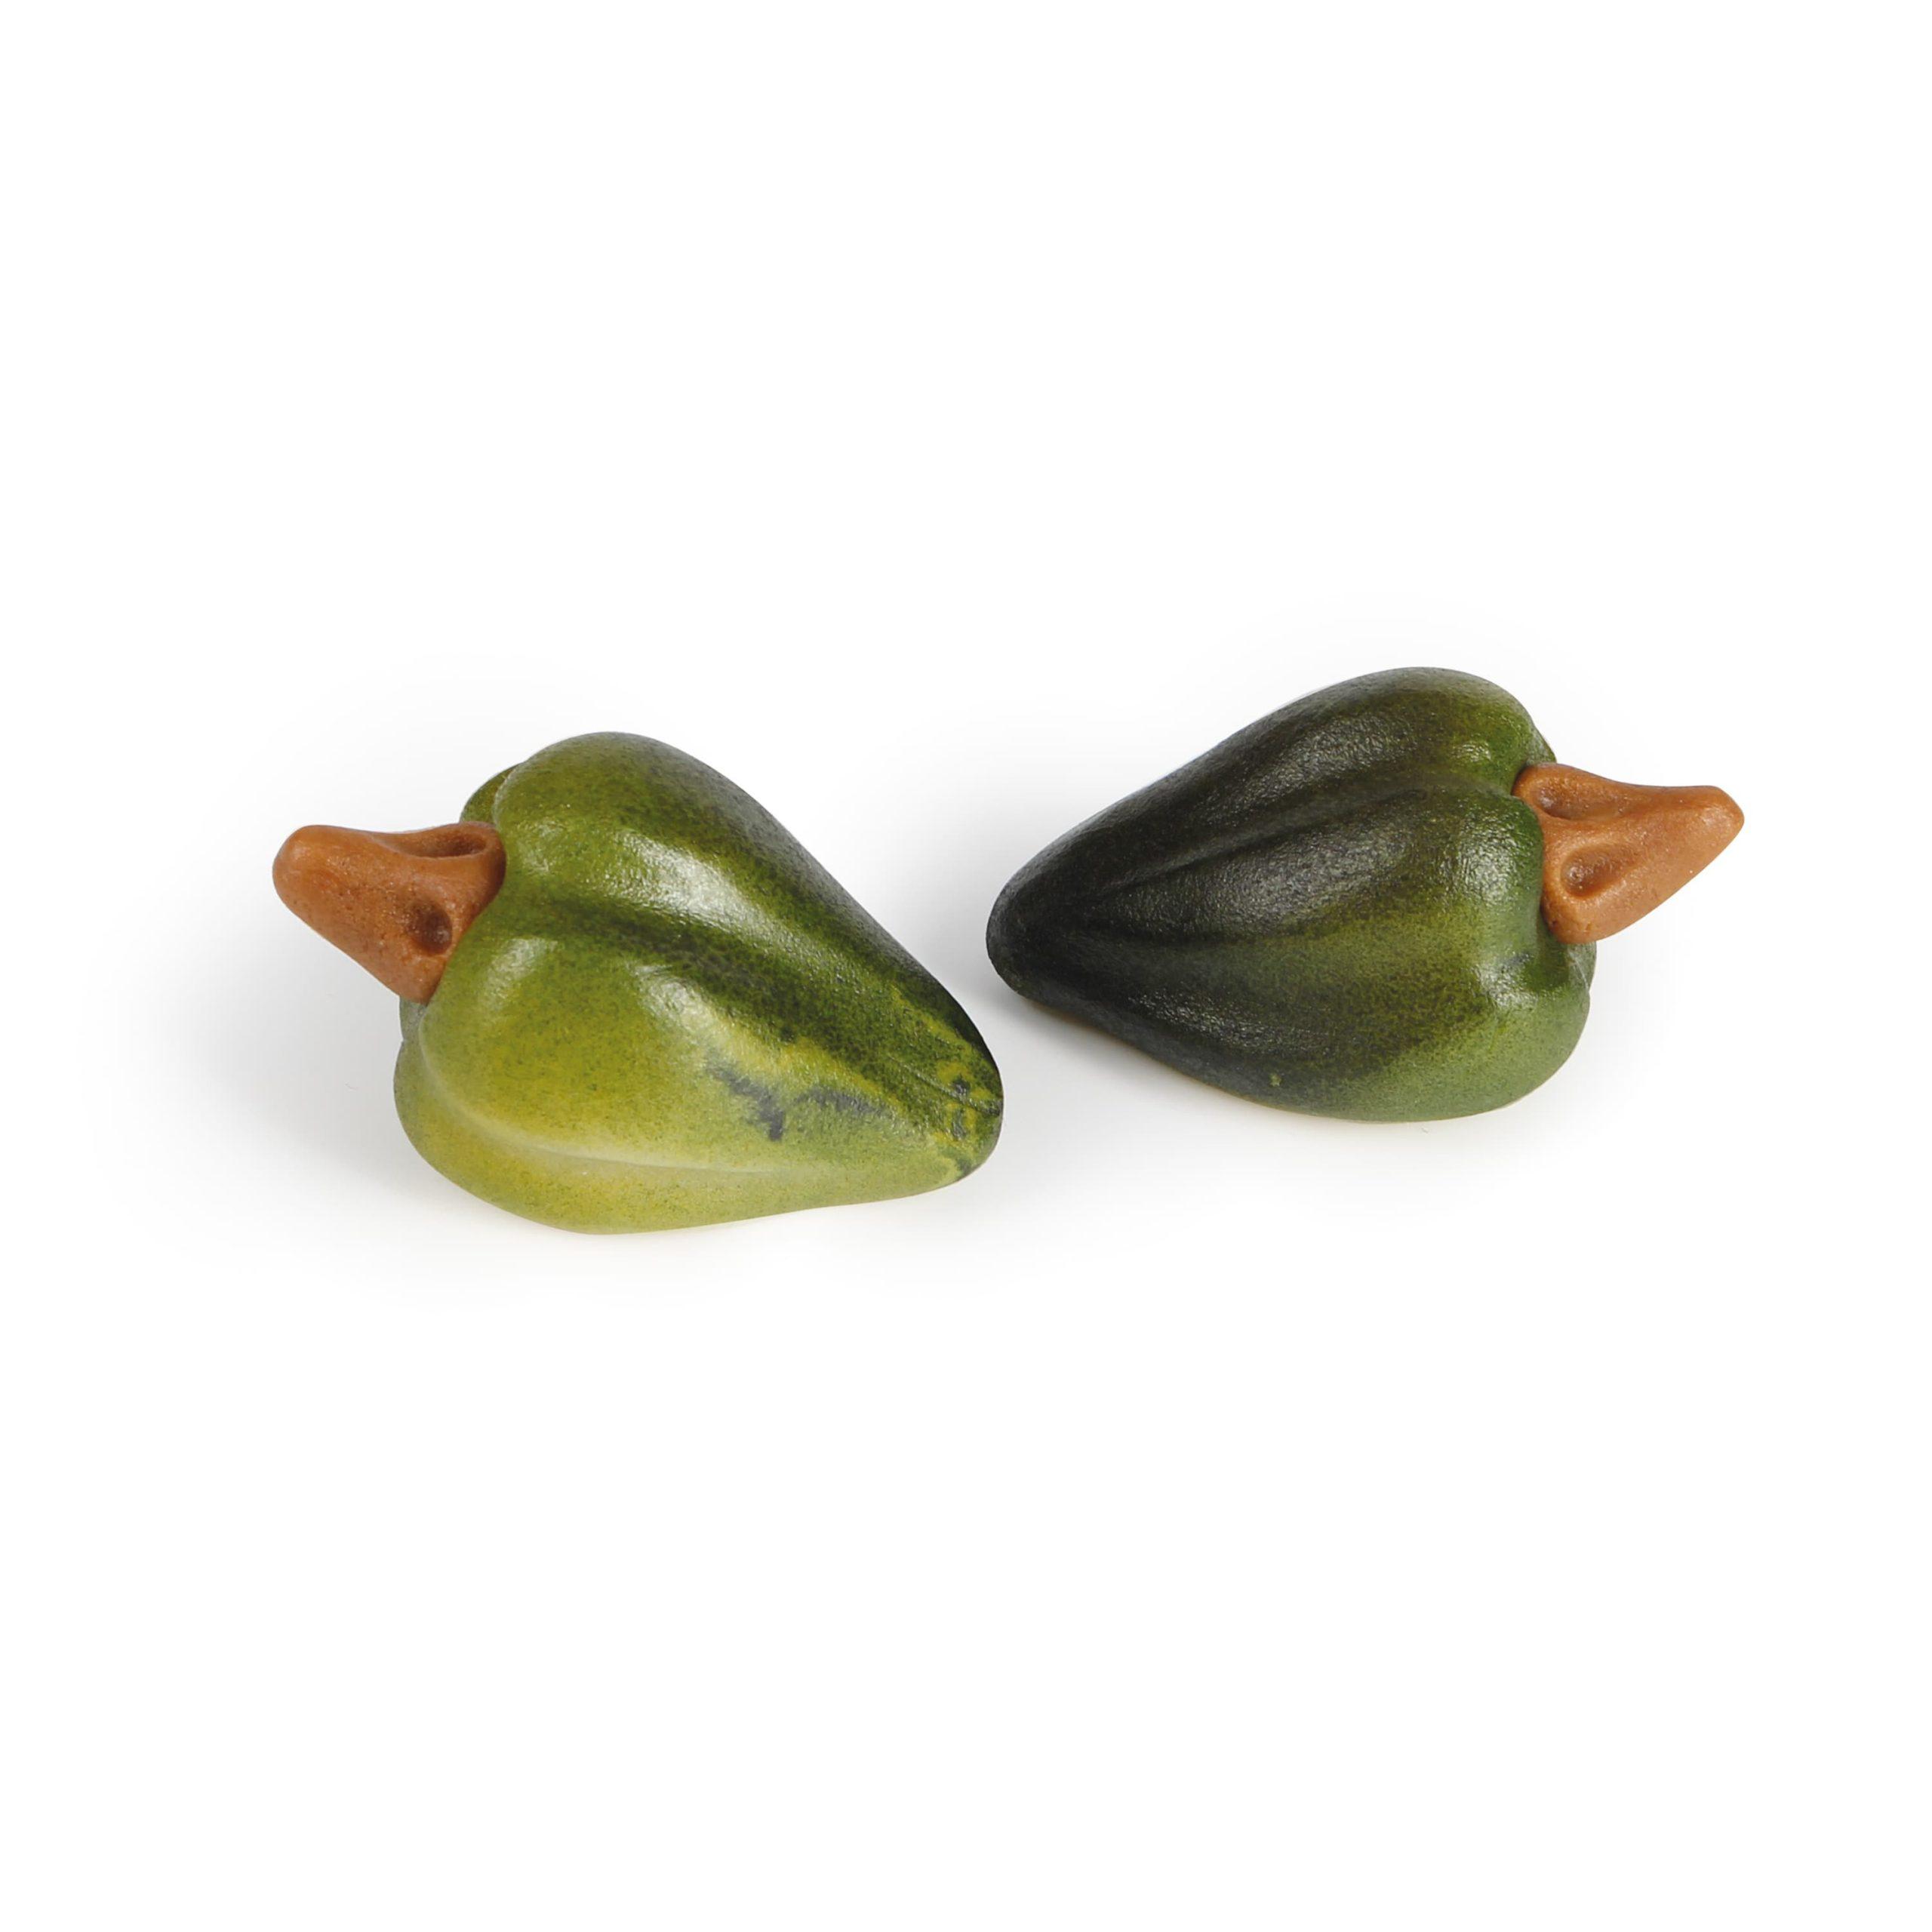 Marsepein Groente - Paprika Groen